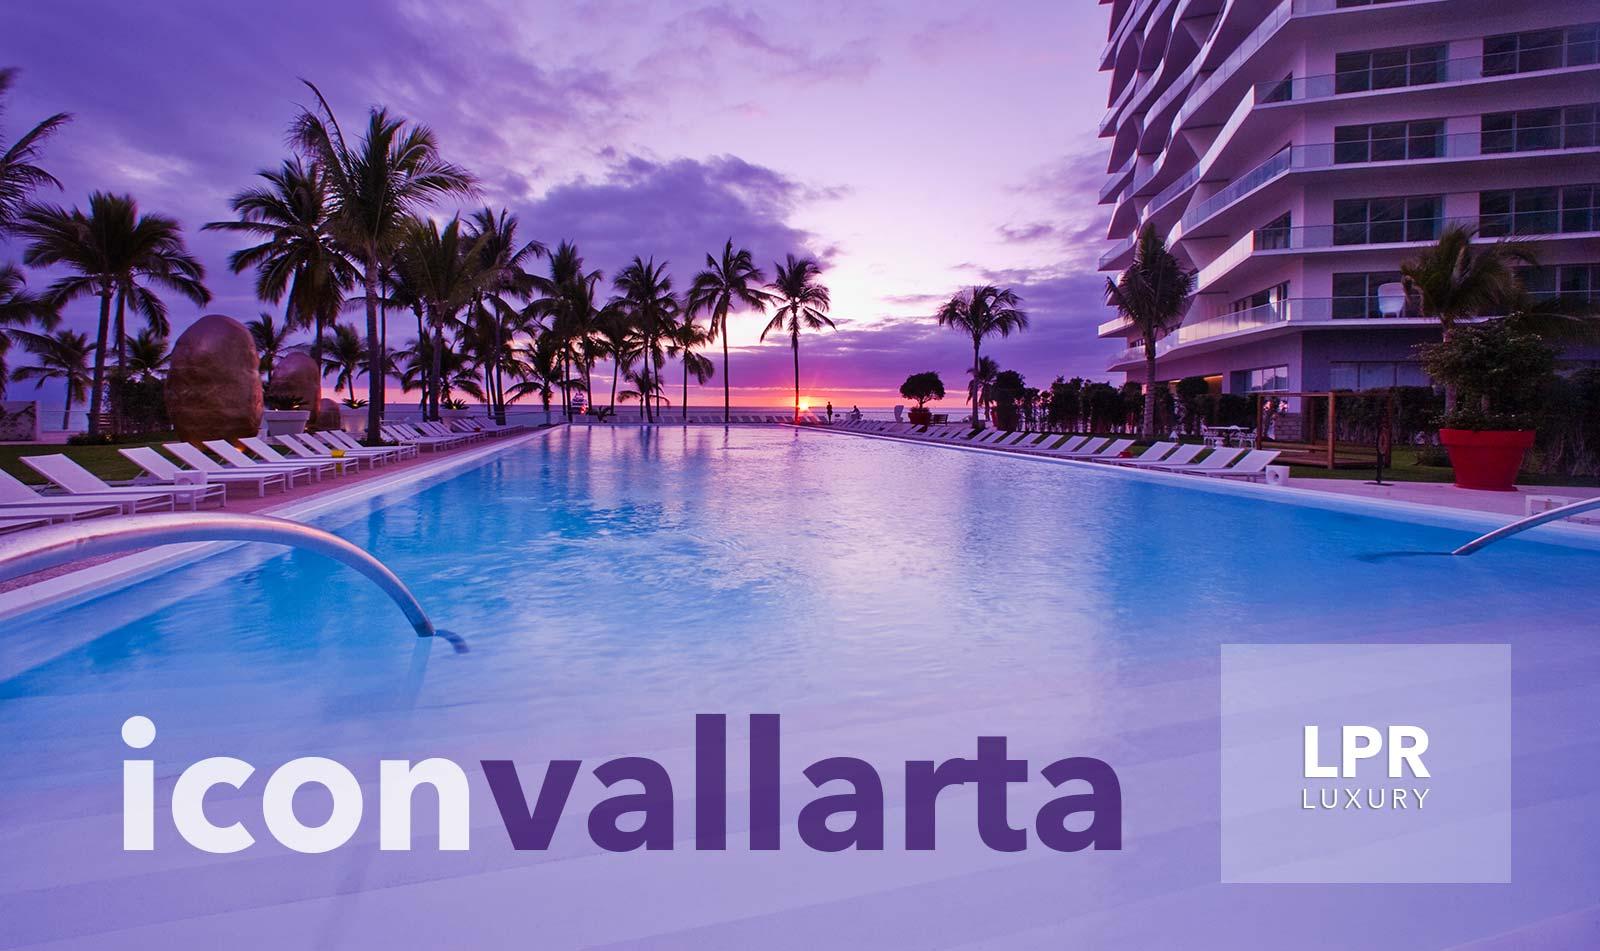 Icon Valarta - Puerto Vallarta Luxury beachfront condos for sale and rent - Hotel Zone Puerto Vallarta real estate